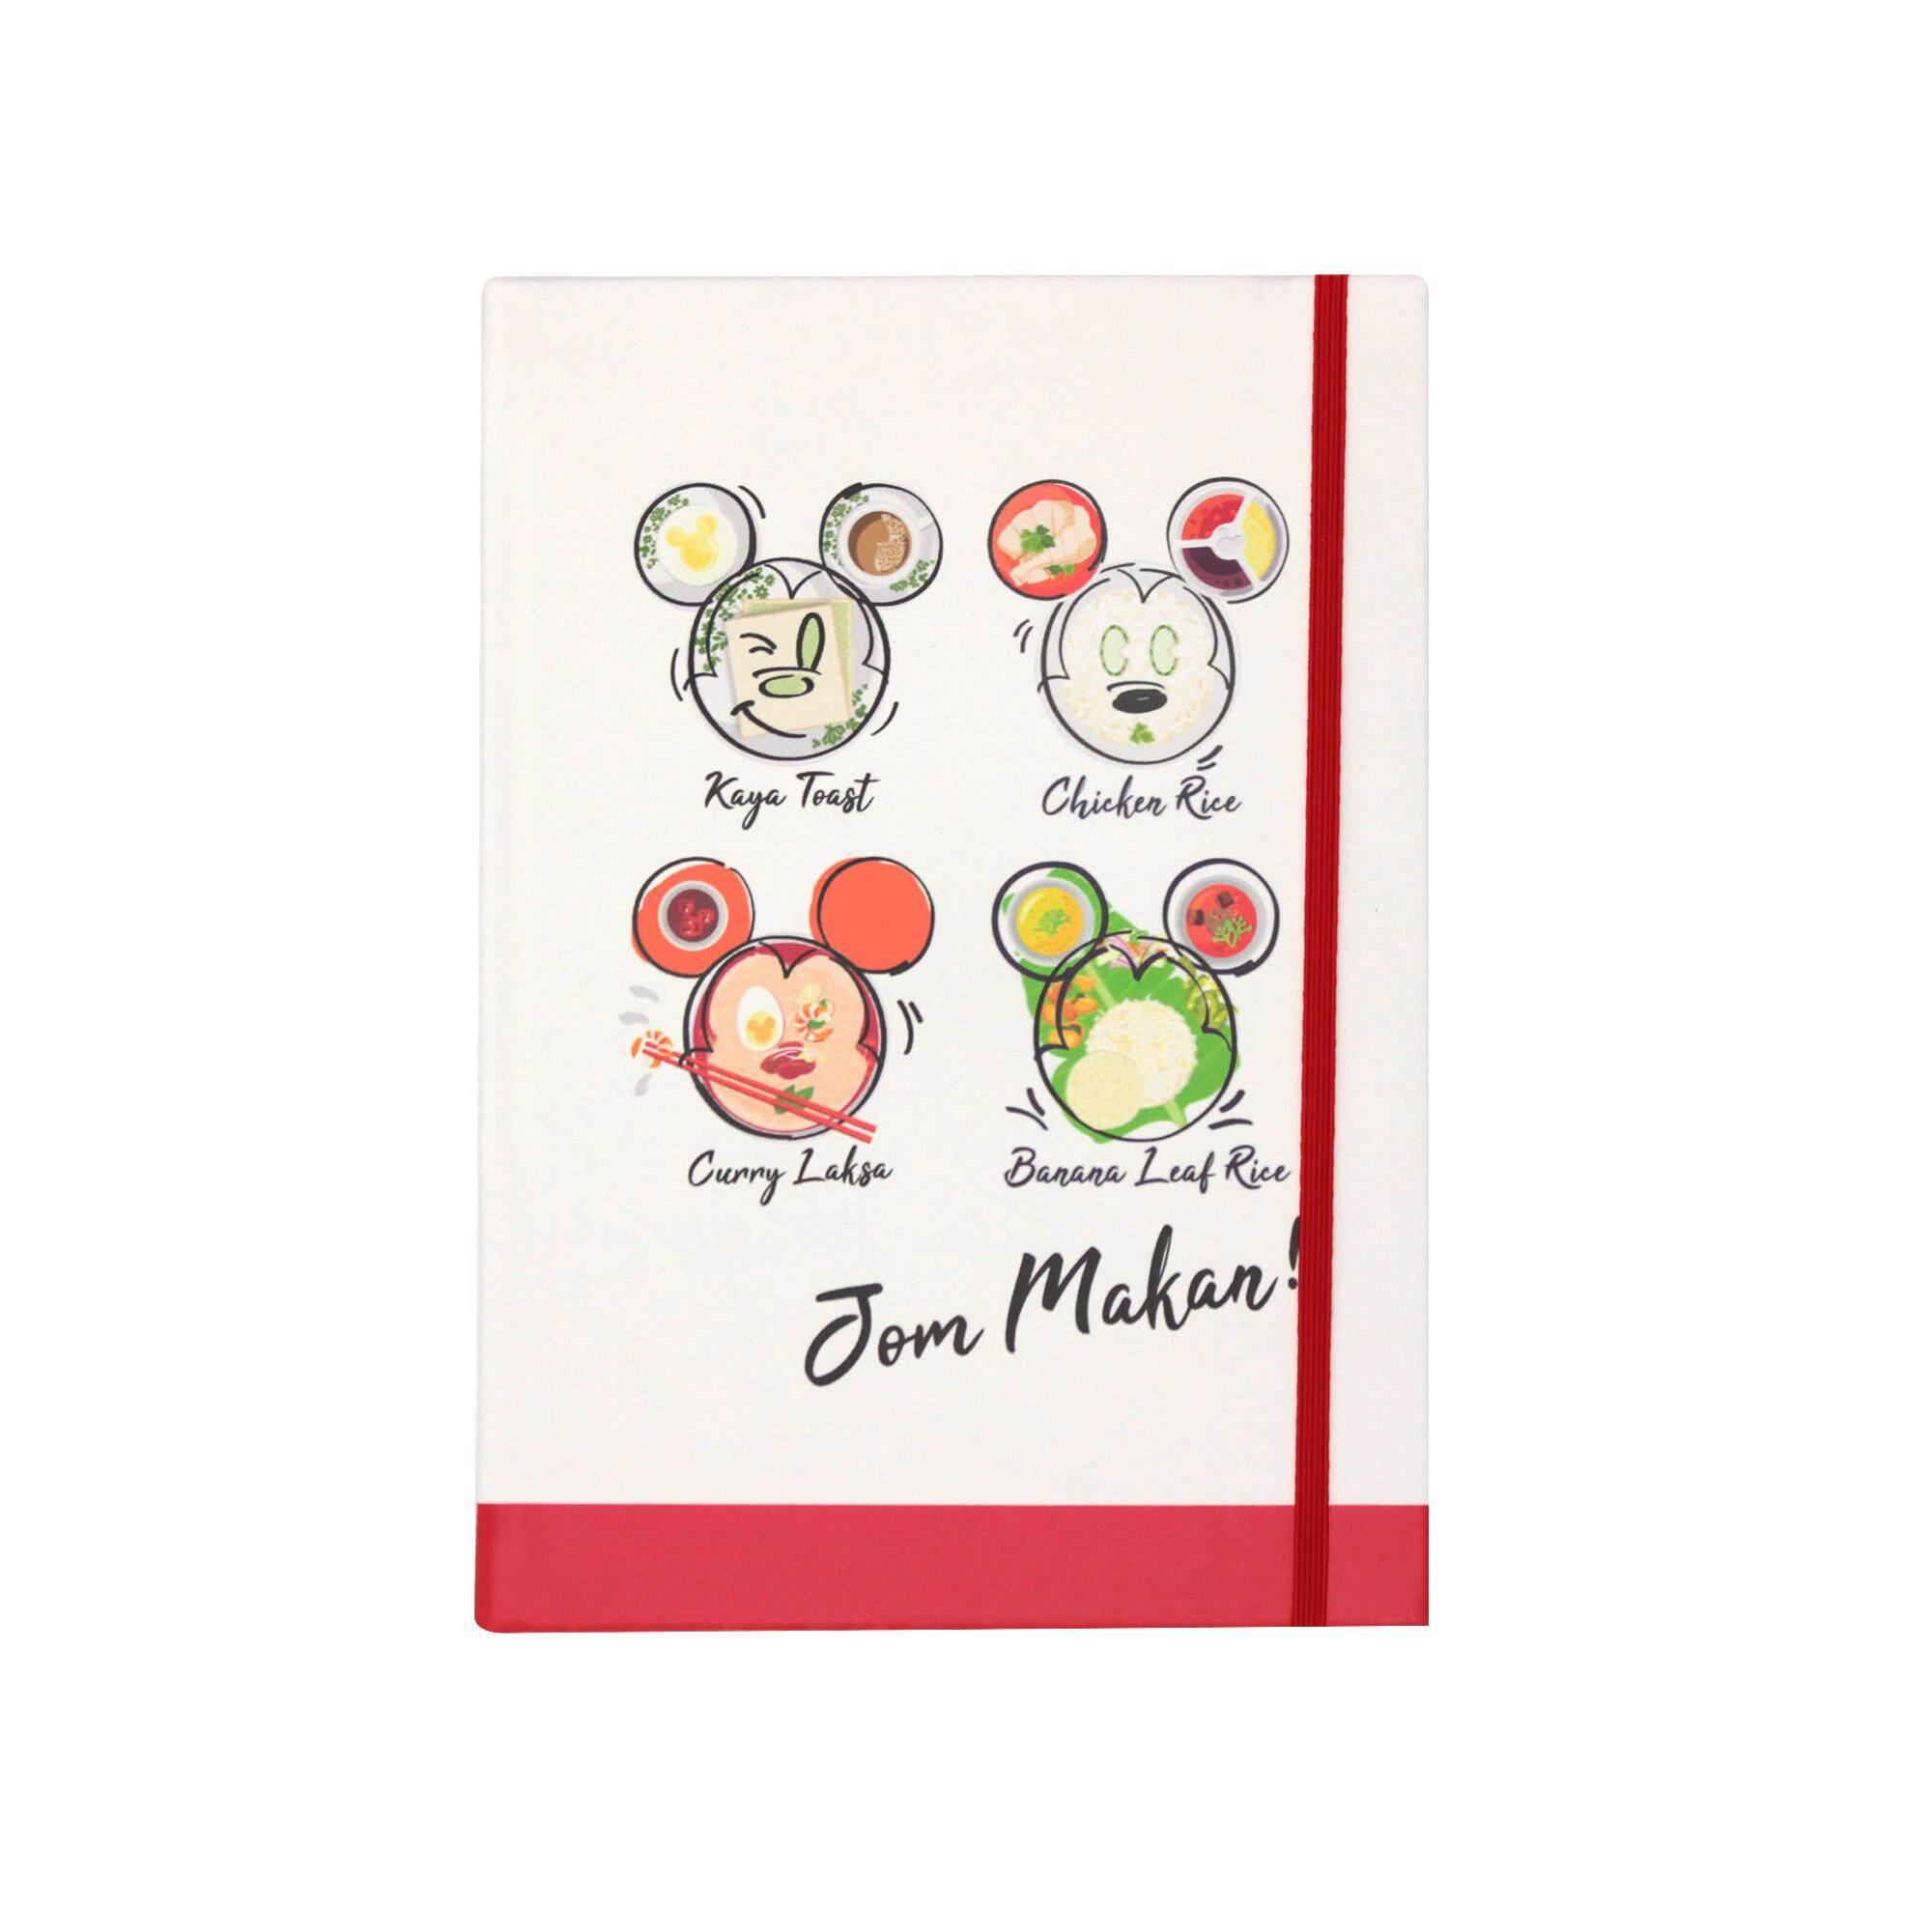 Disney Mickey Go Local 100 Sheets A5 Hard Cover Notebook - Jom Makan!